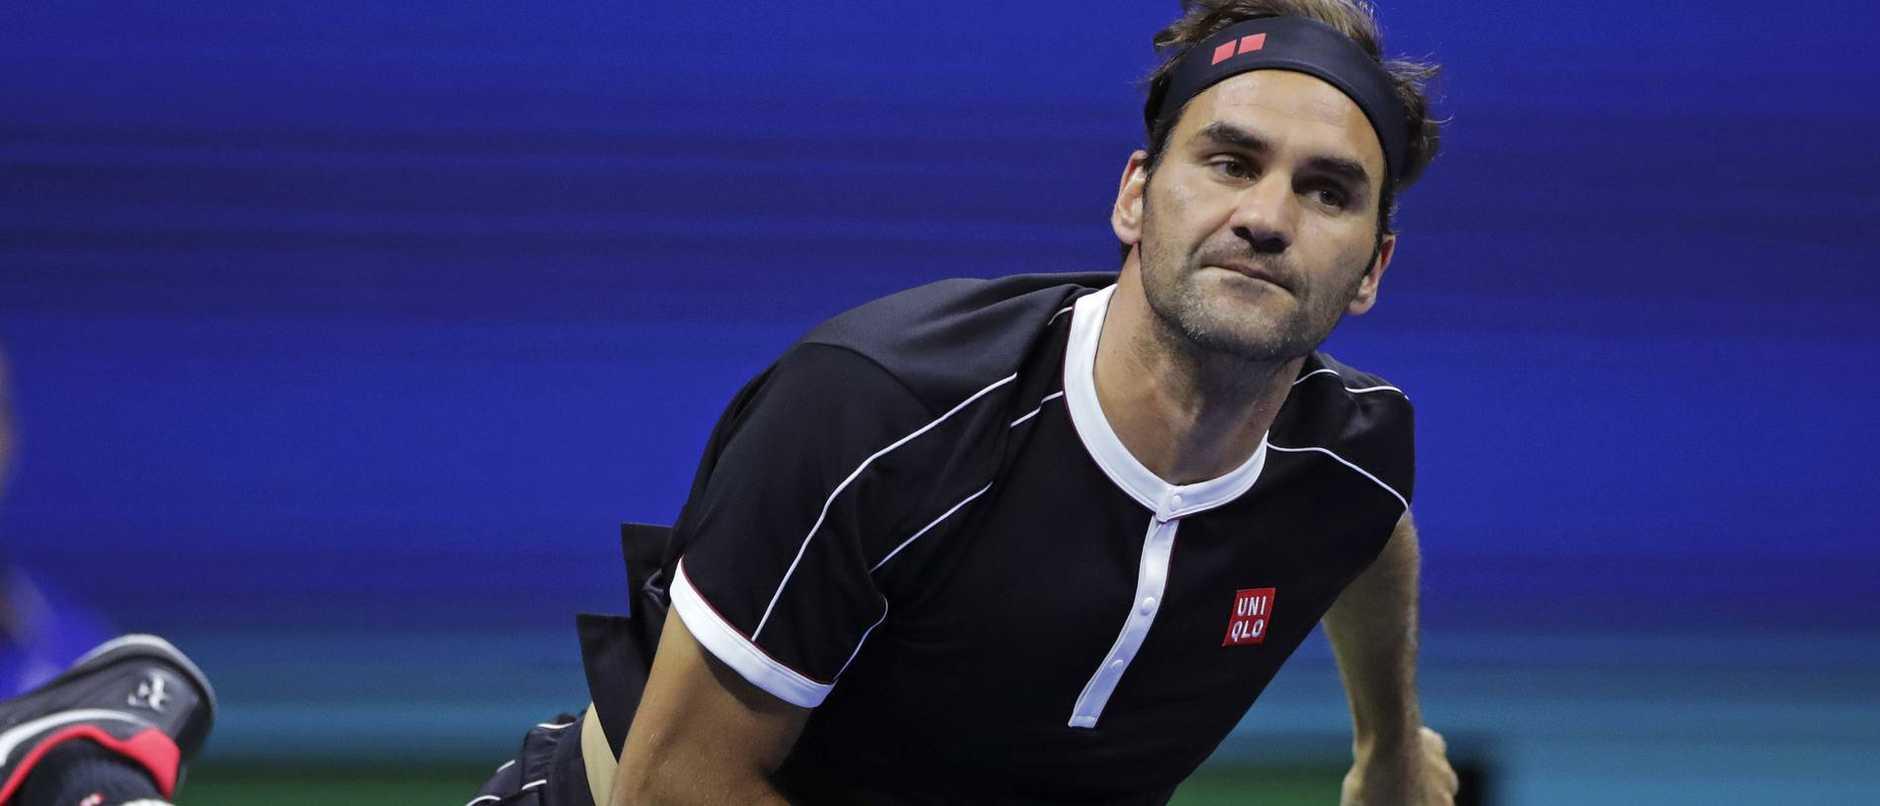 Federer started well.